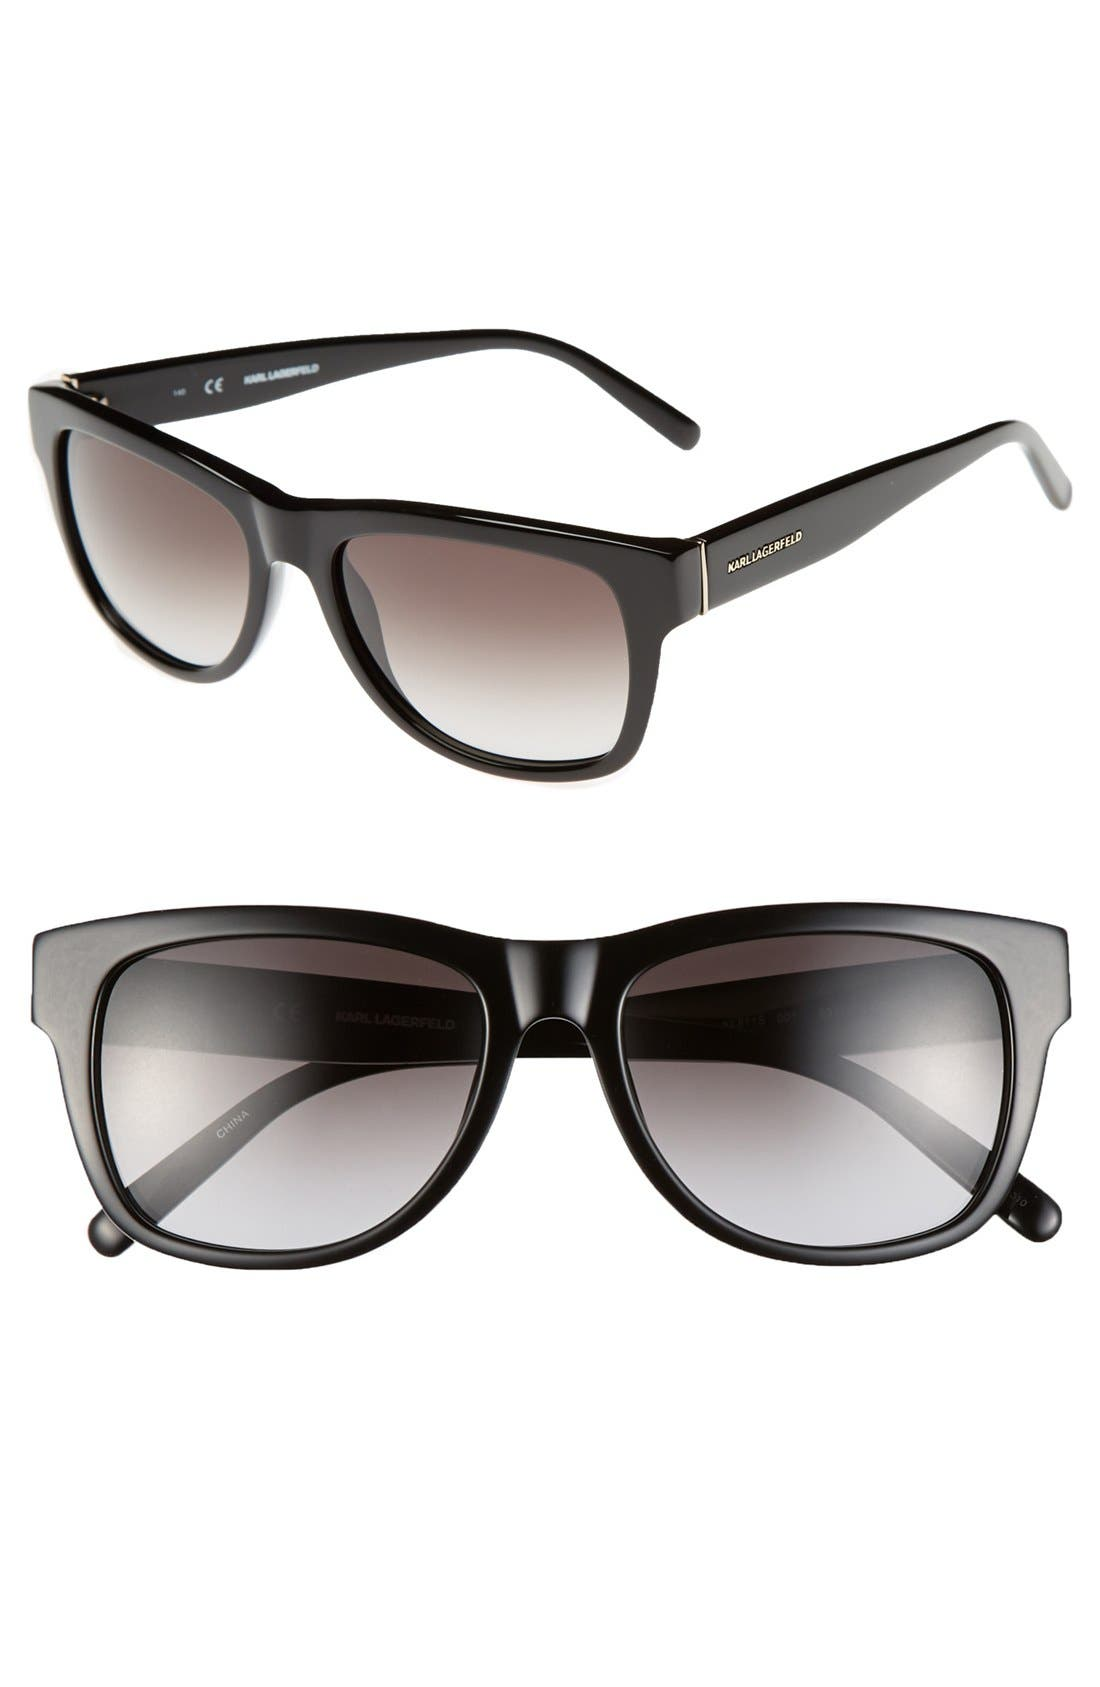 Main Image - Karl Lagerfeld 53mm Rectangular Cat Eye Sunglasses